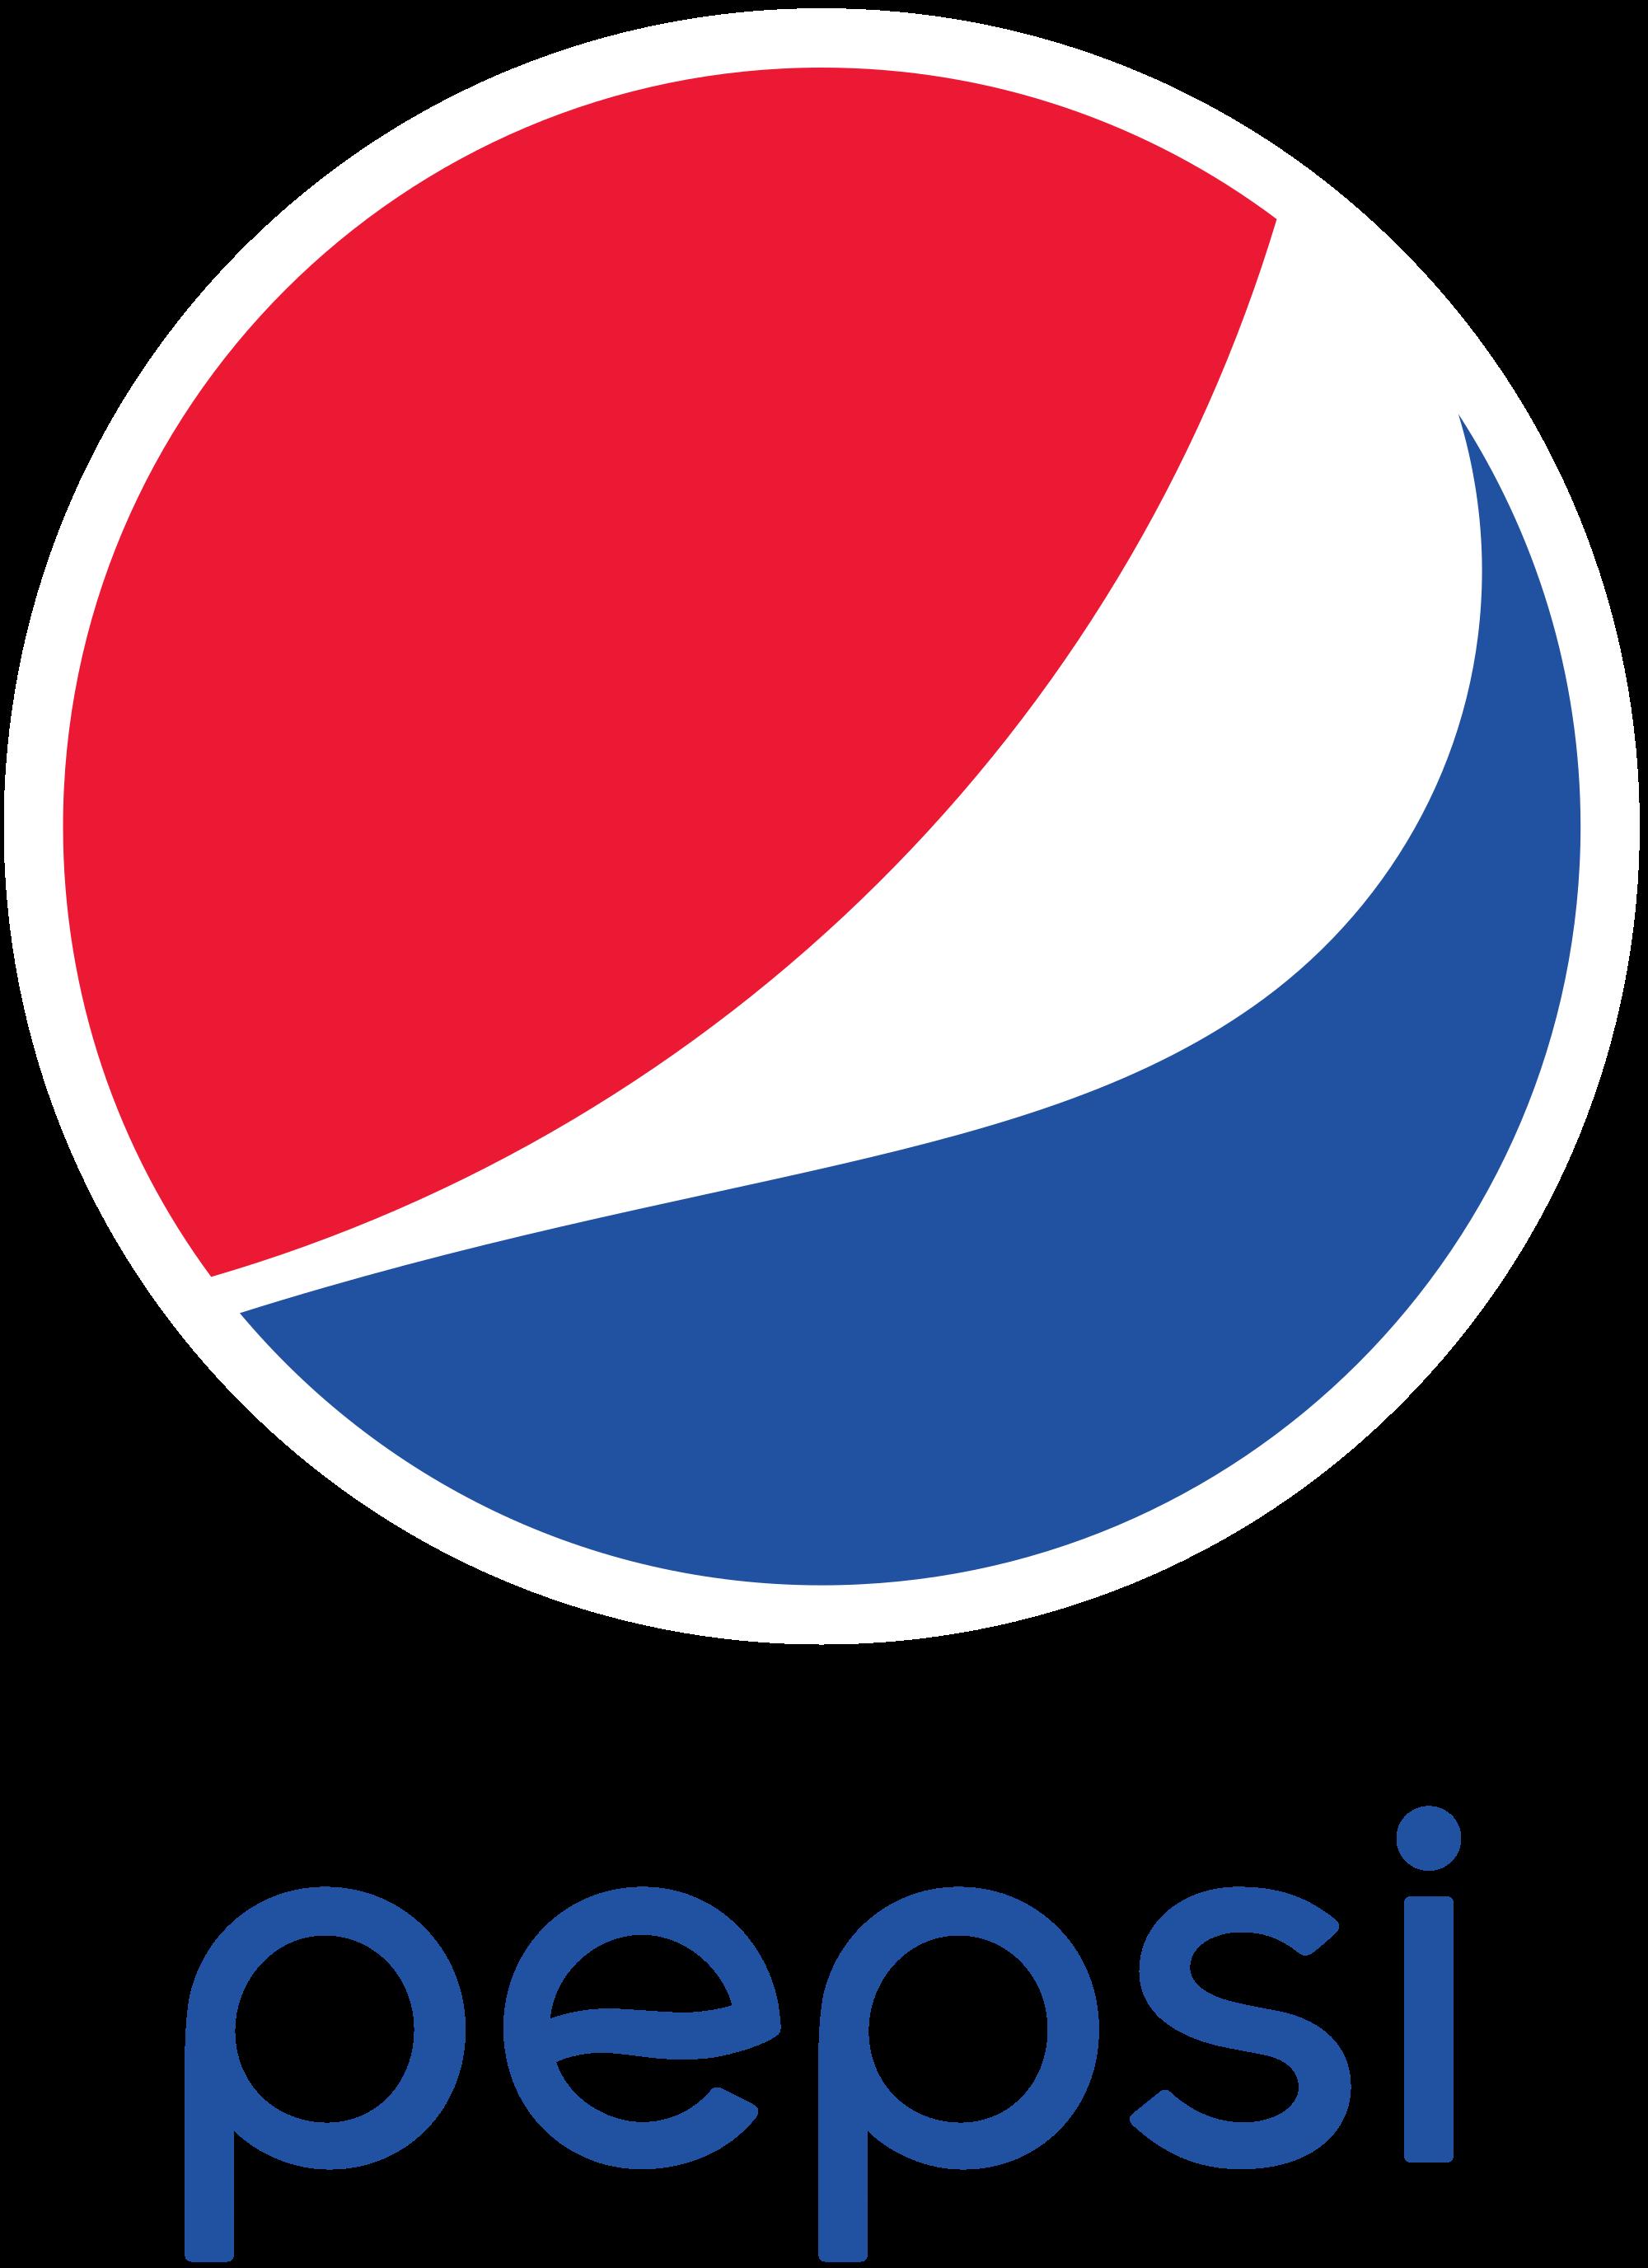 Pepsi_logo.png